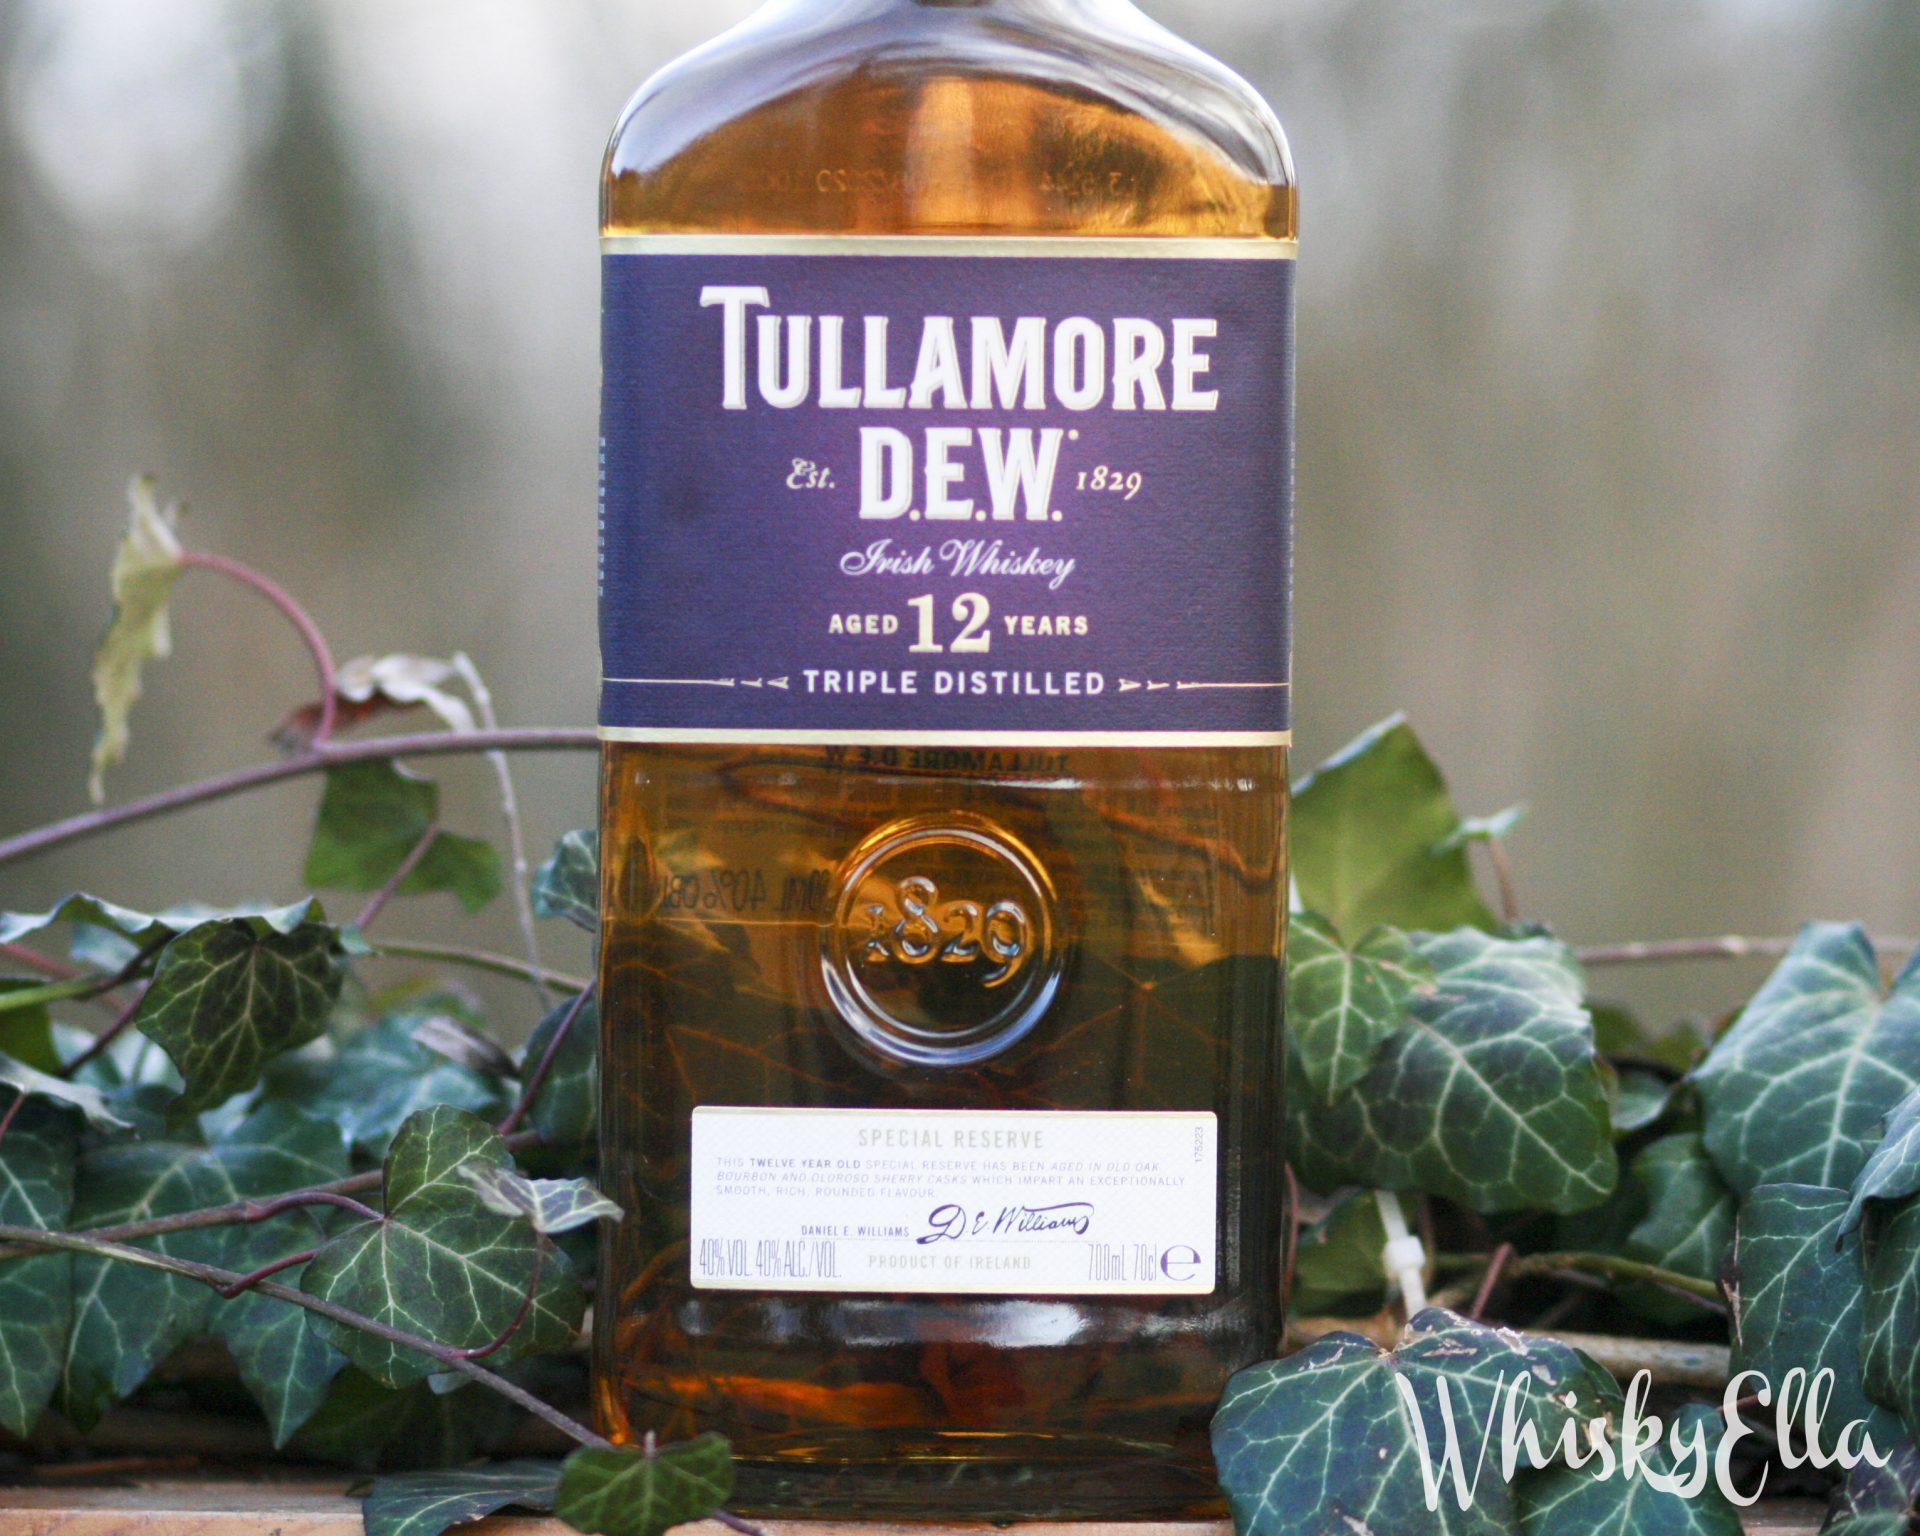 Nasza recenzja Tullamore Dew 12 yo Special Reserve #96